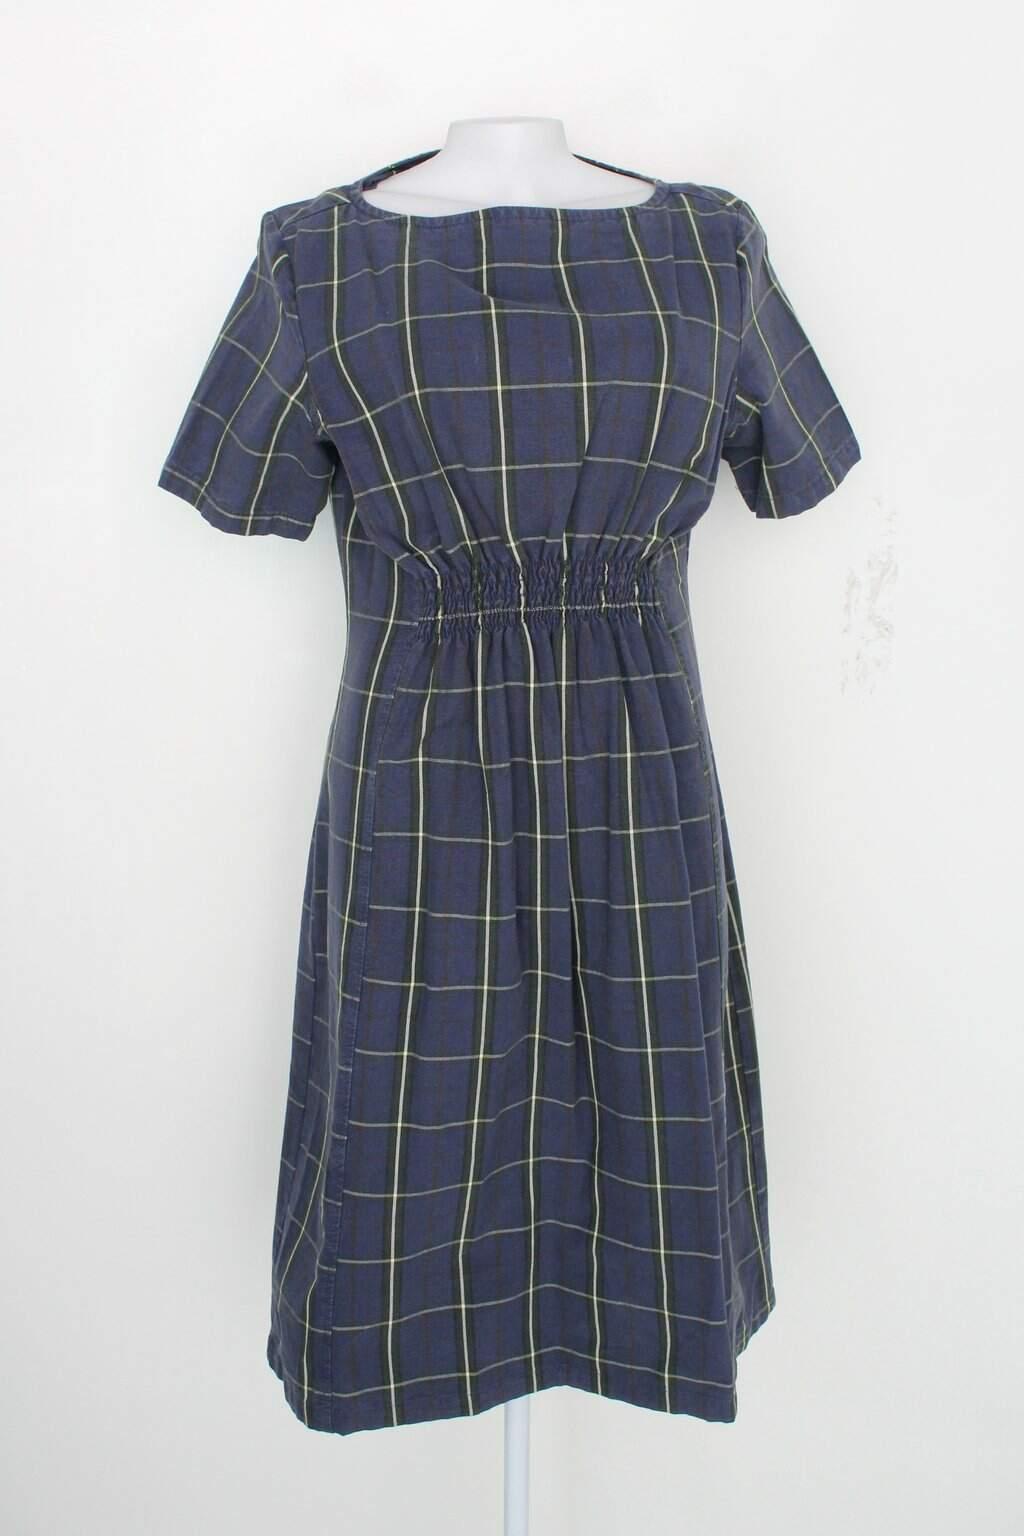 Vestido Erva Doce Feminino Azul Xadrez